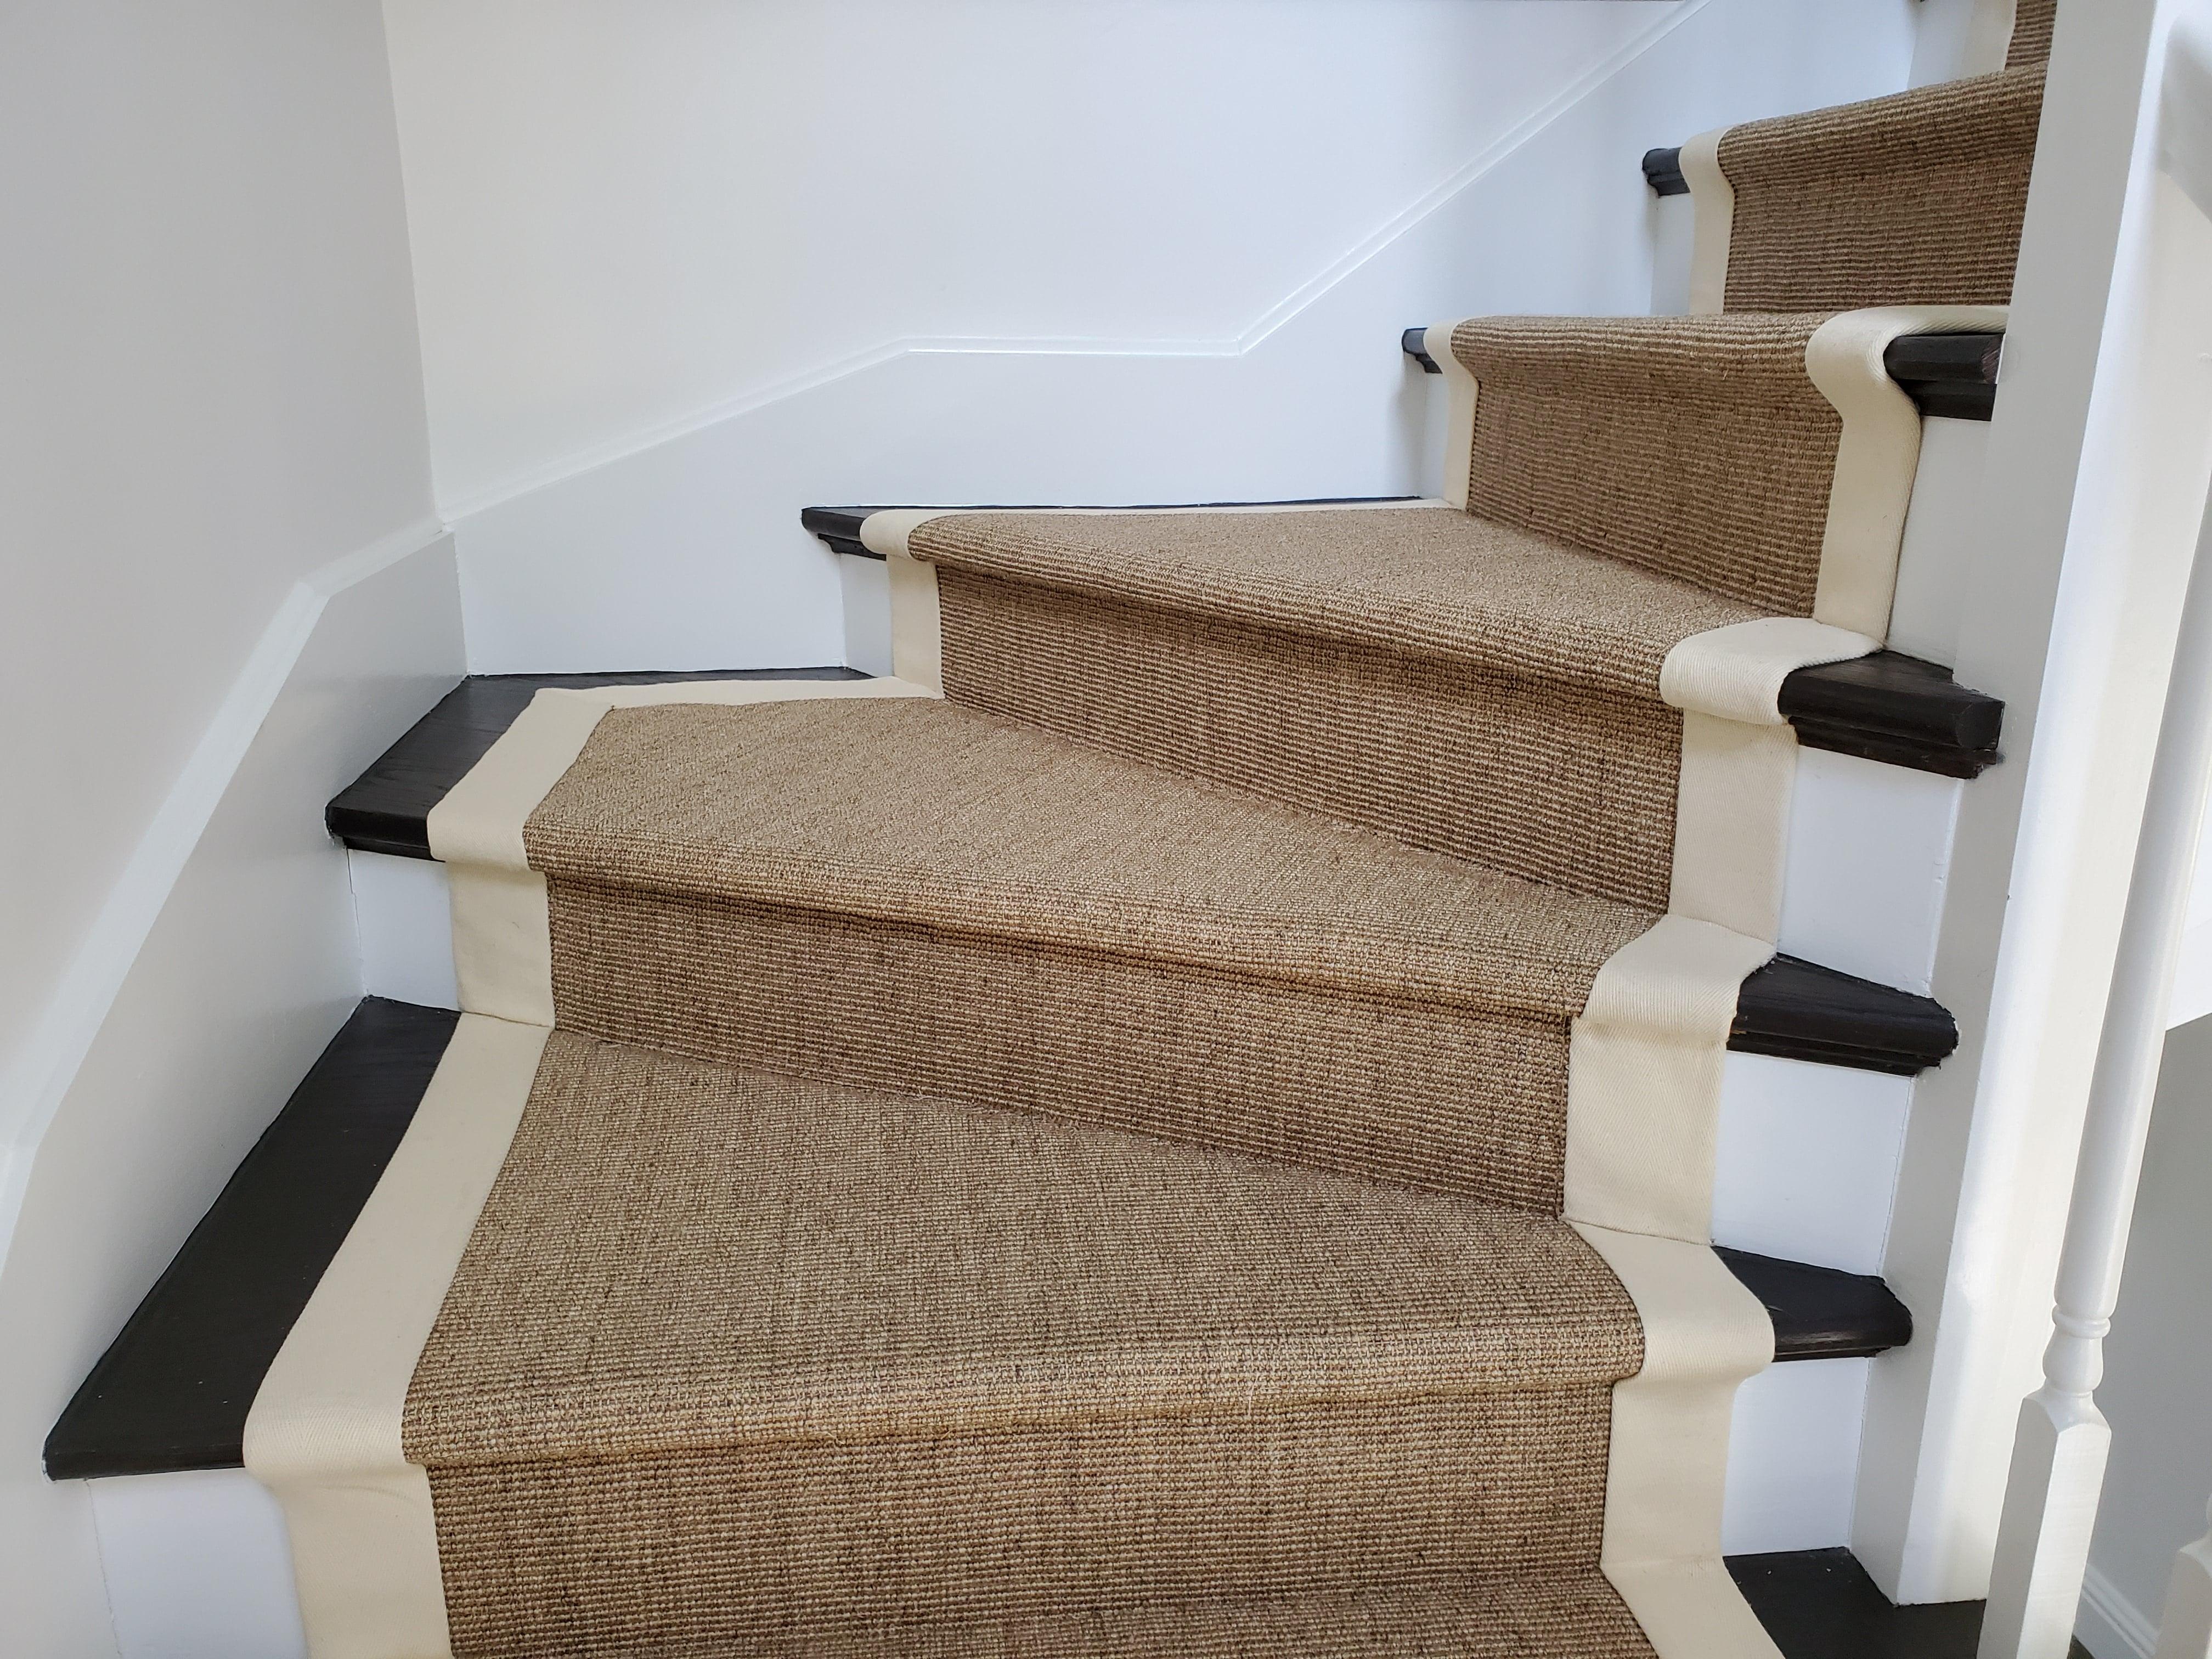 Custom Stair Runners Decorative Rods